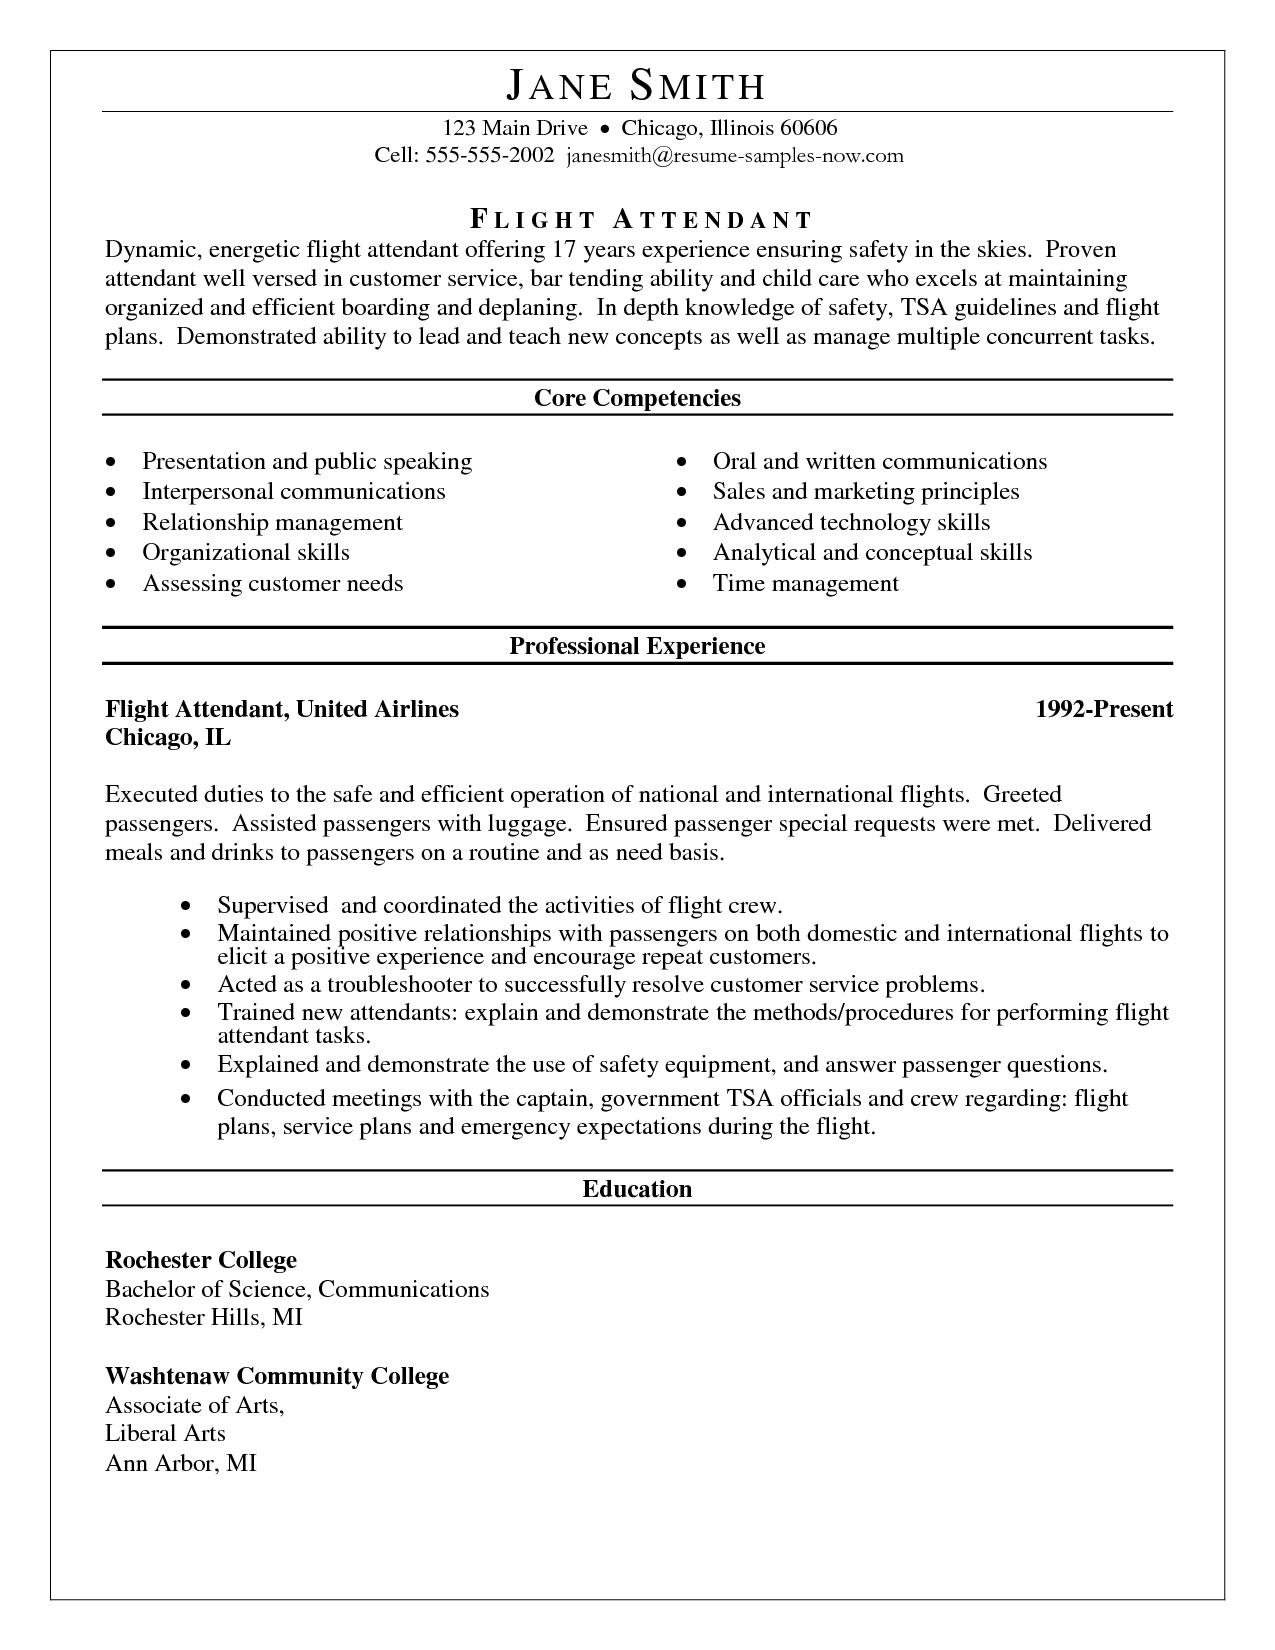 Resume Examples Key Competencies Competencies Examples Resume Resumeexamples Flight Attendant Resume Teacher Resume Examples Resume Examples